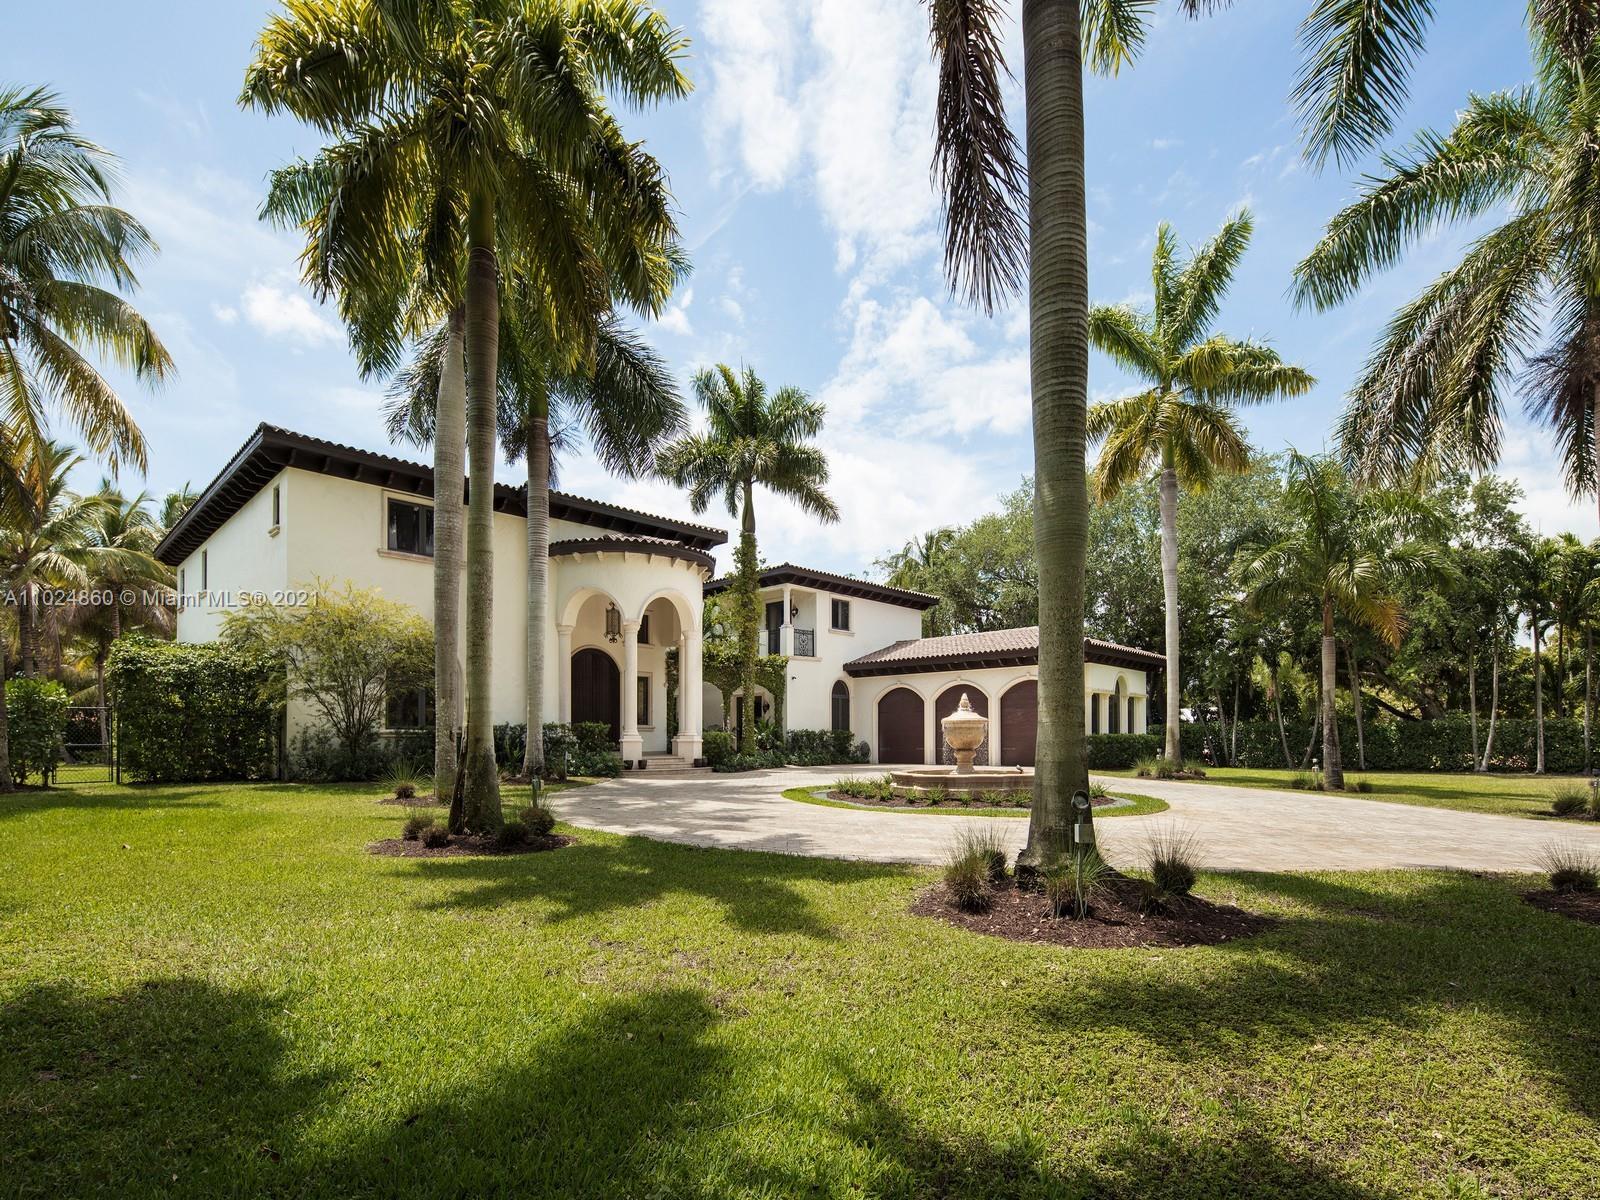 6706 67th St, South Miami, Florida 33143